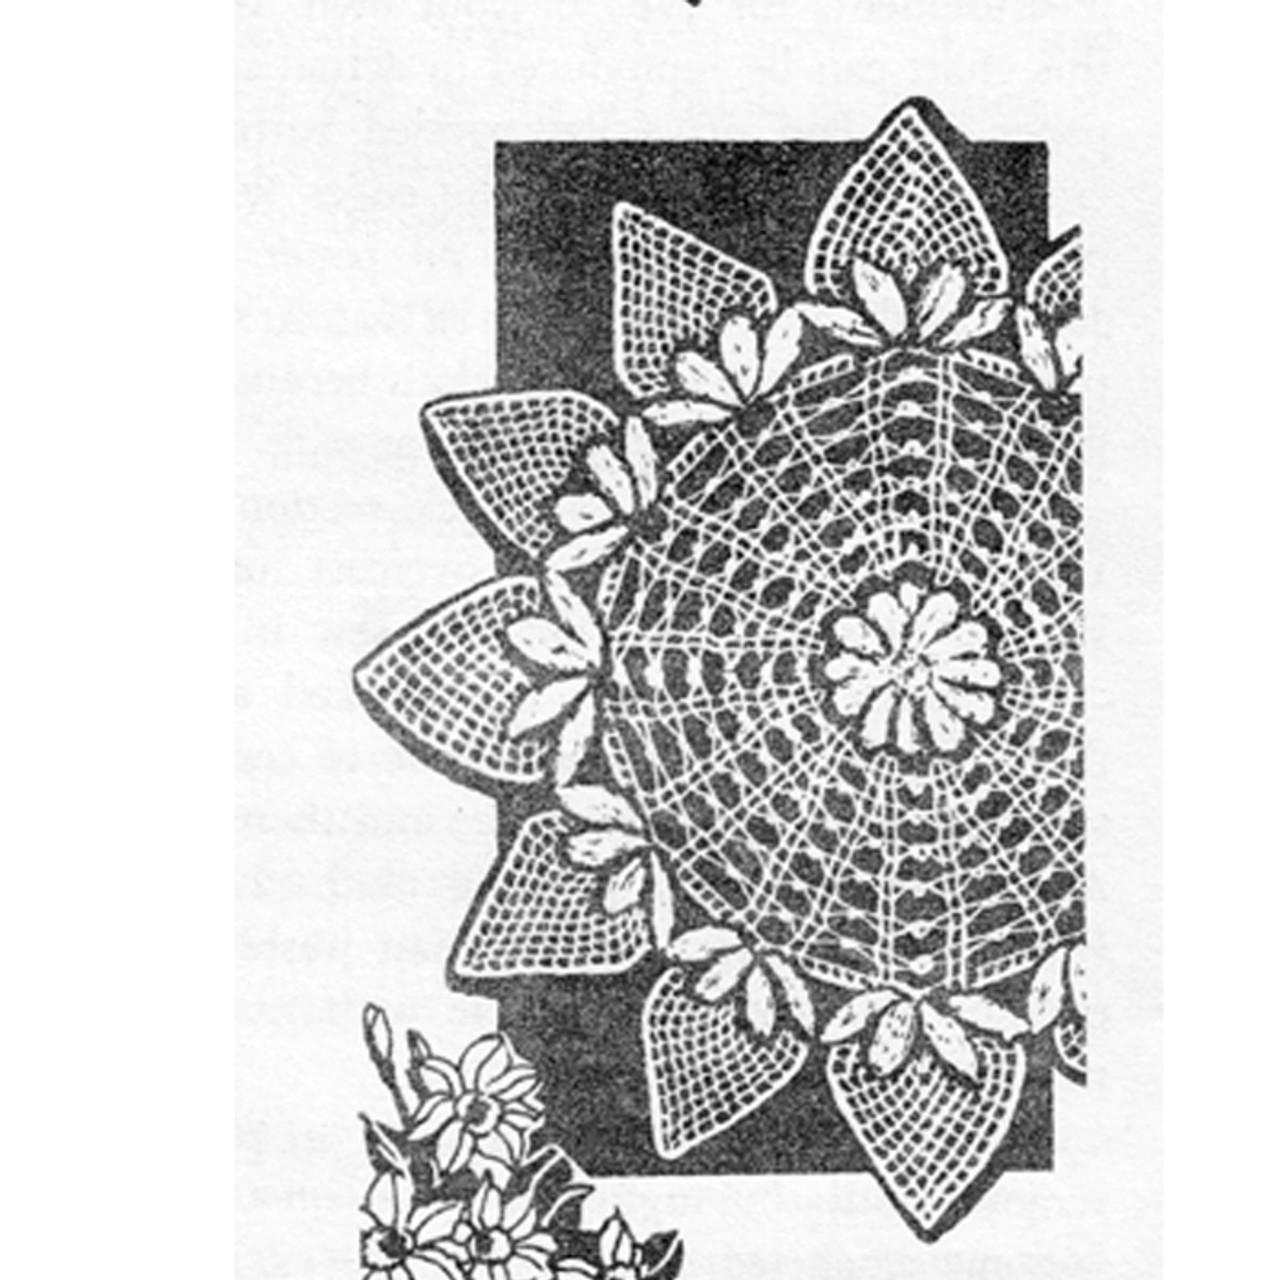 Design 7335, Strawberry Crochet Doily Pattern